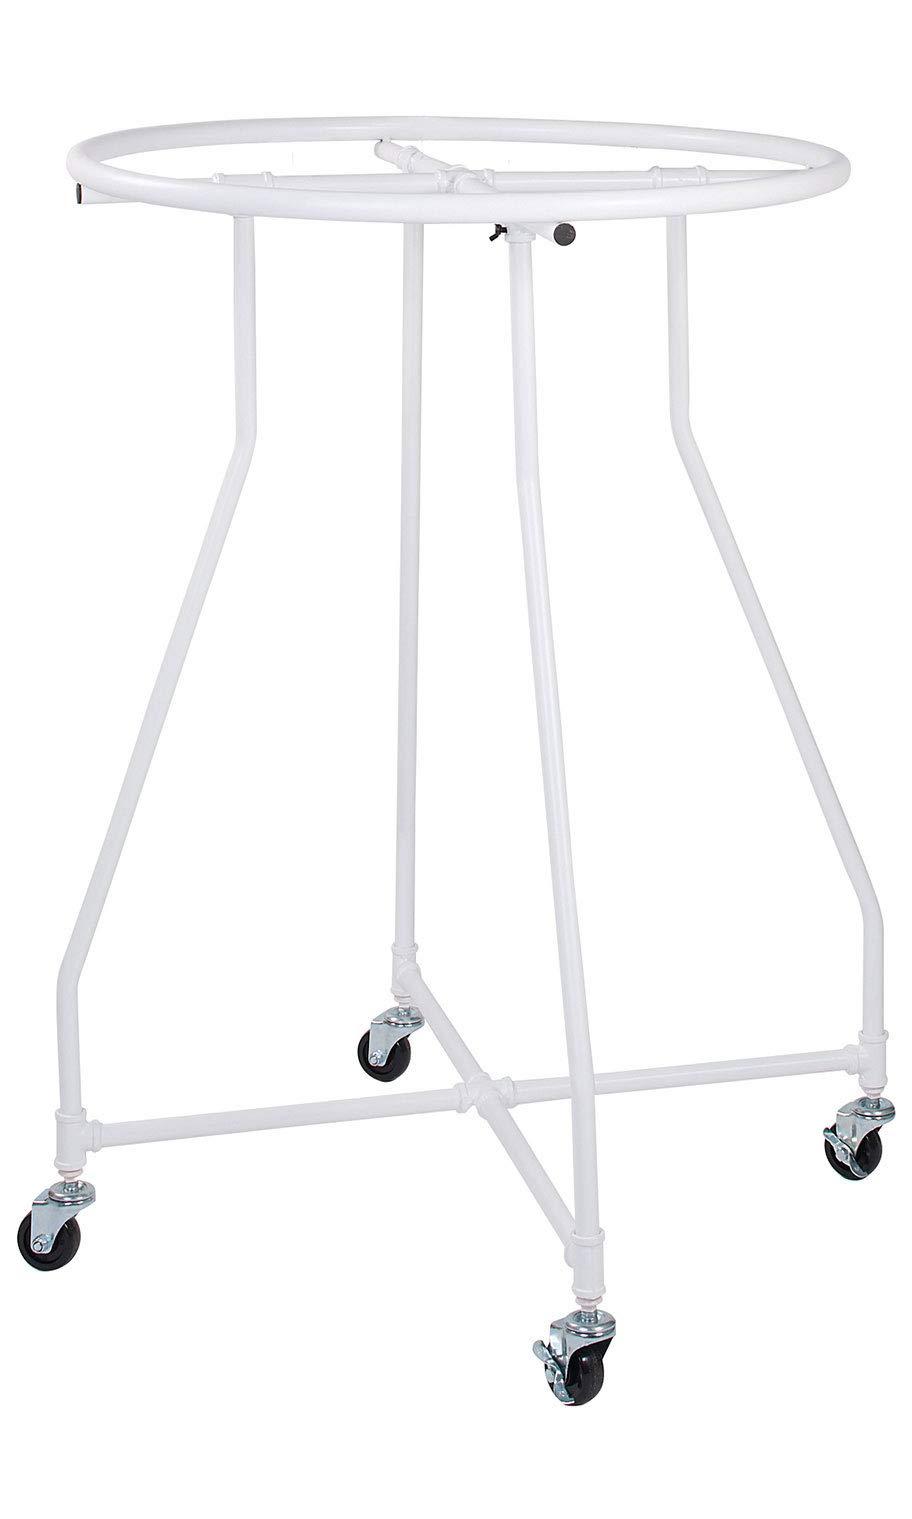 "SSWBasics Boutique White Pipe Round Clothing Rack - 48""H x 36"" Diameter"